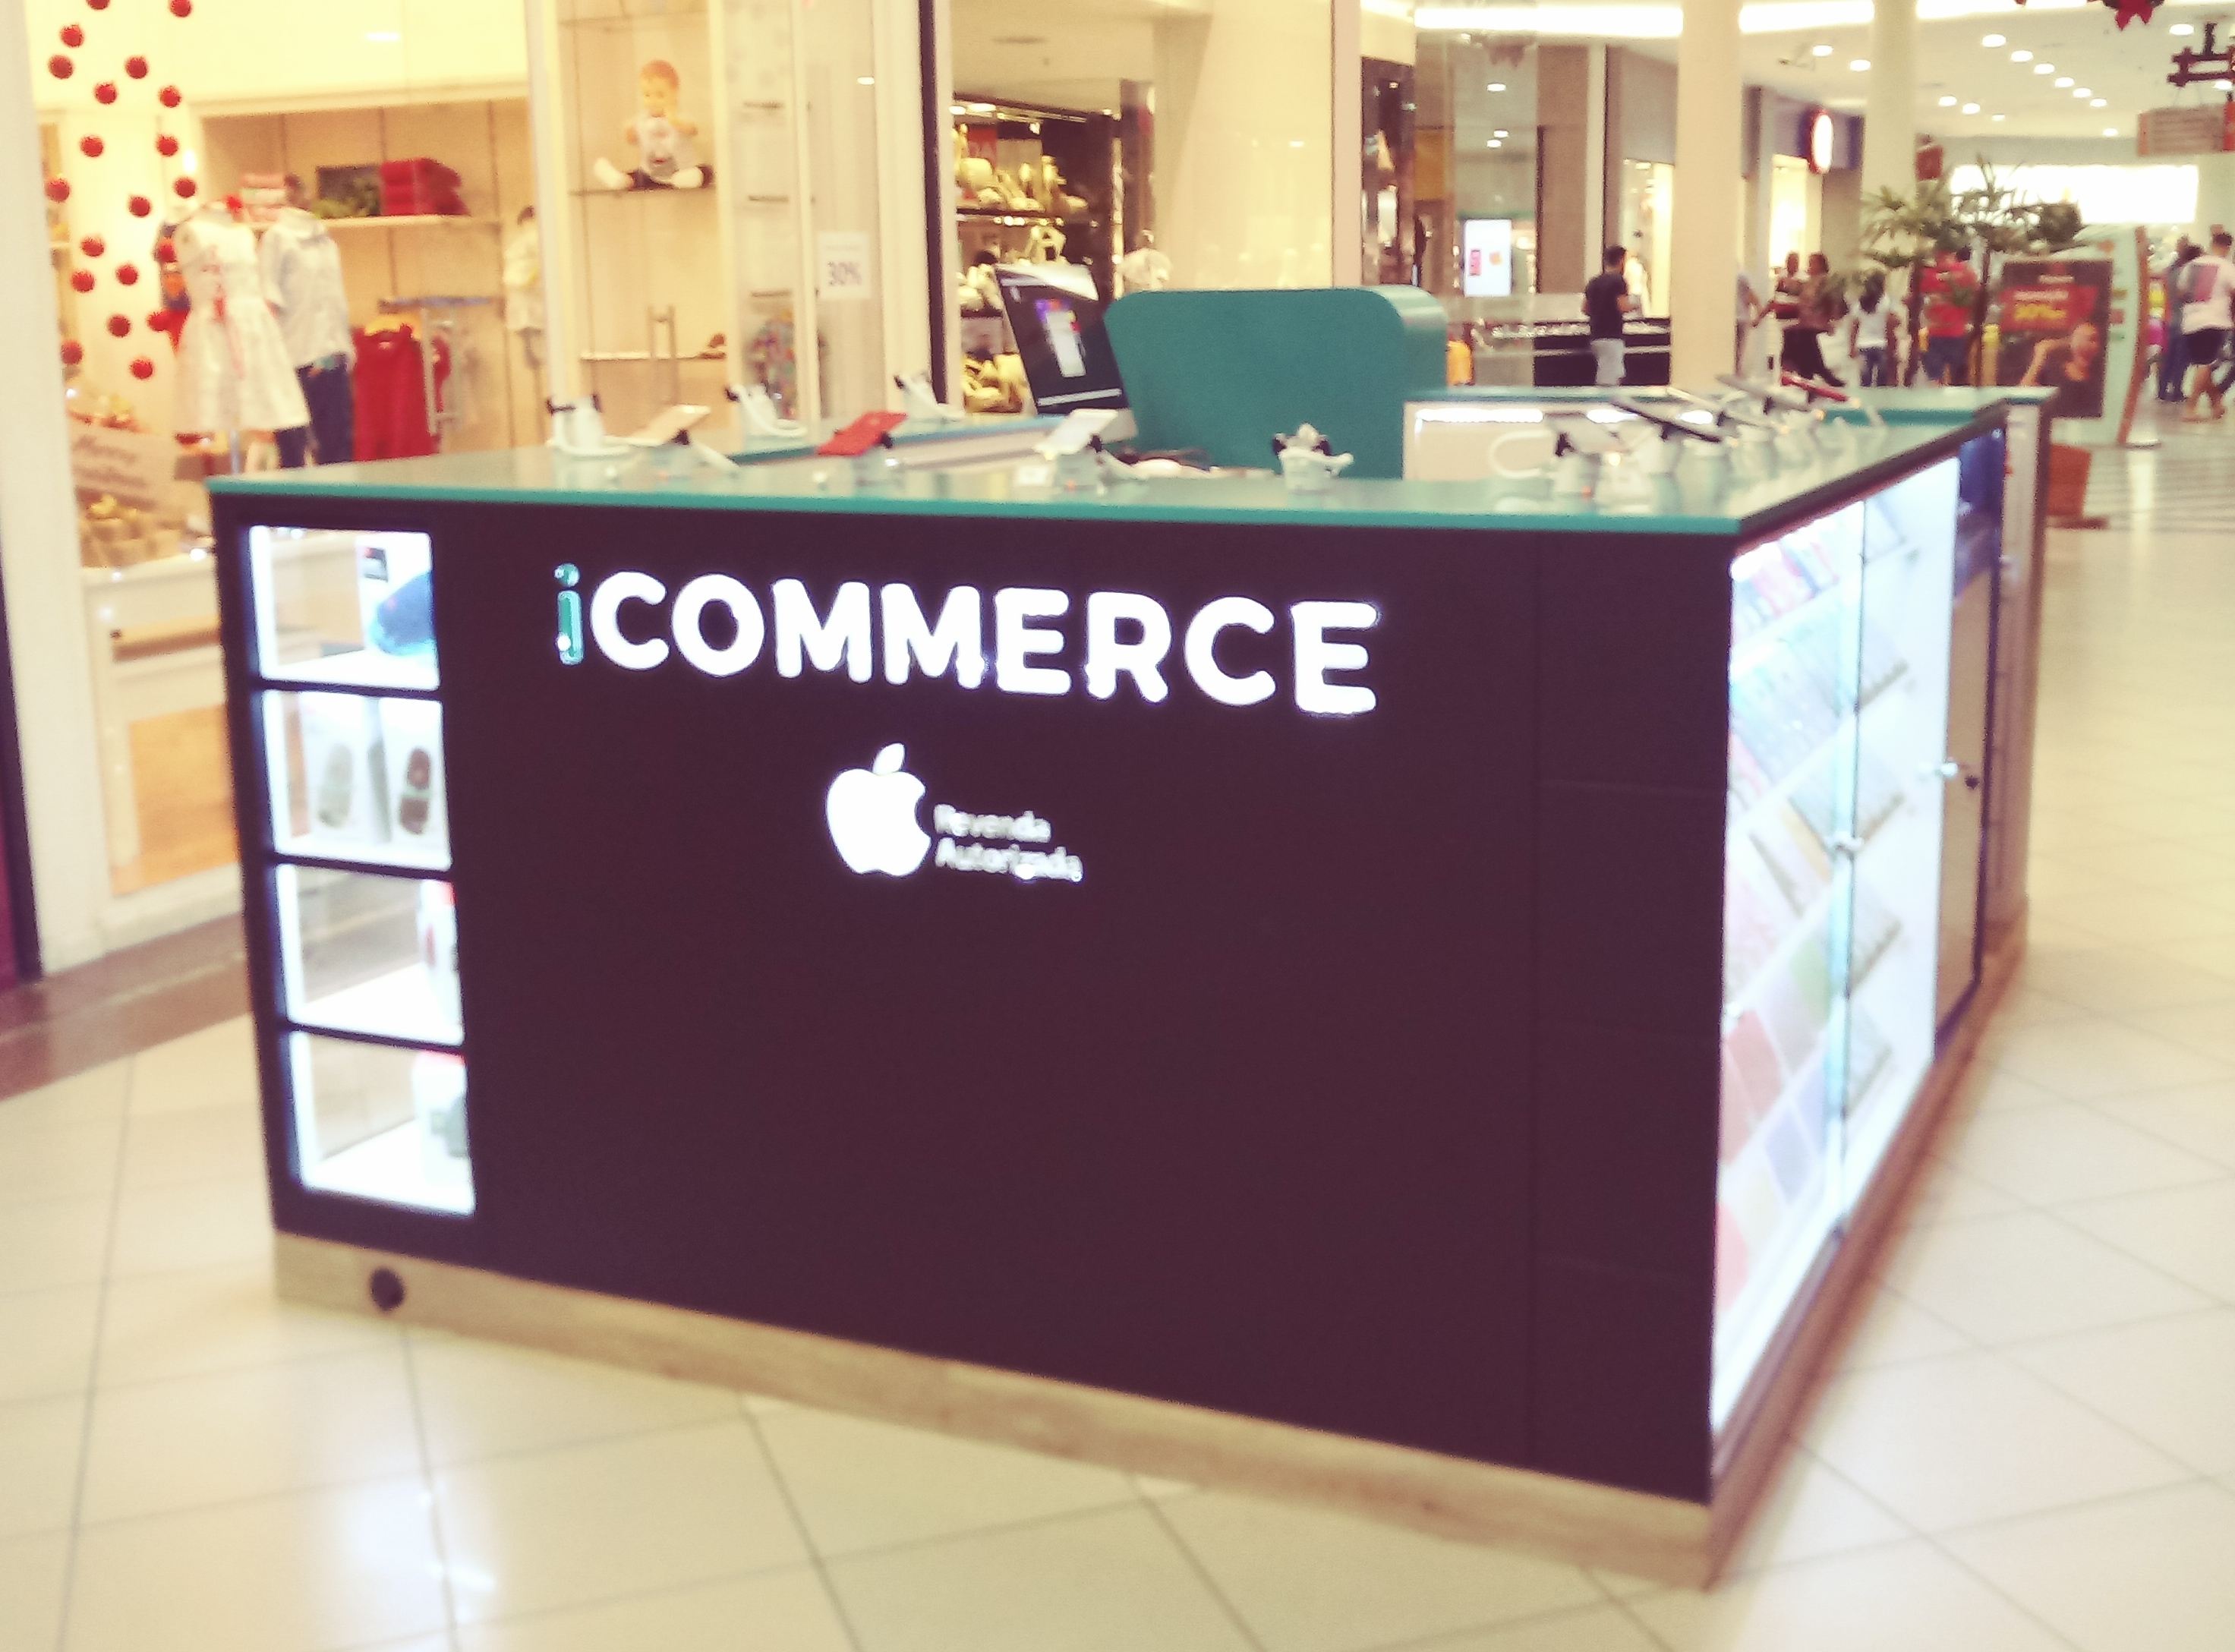 iCommerce capa.jpg